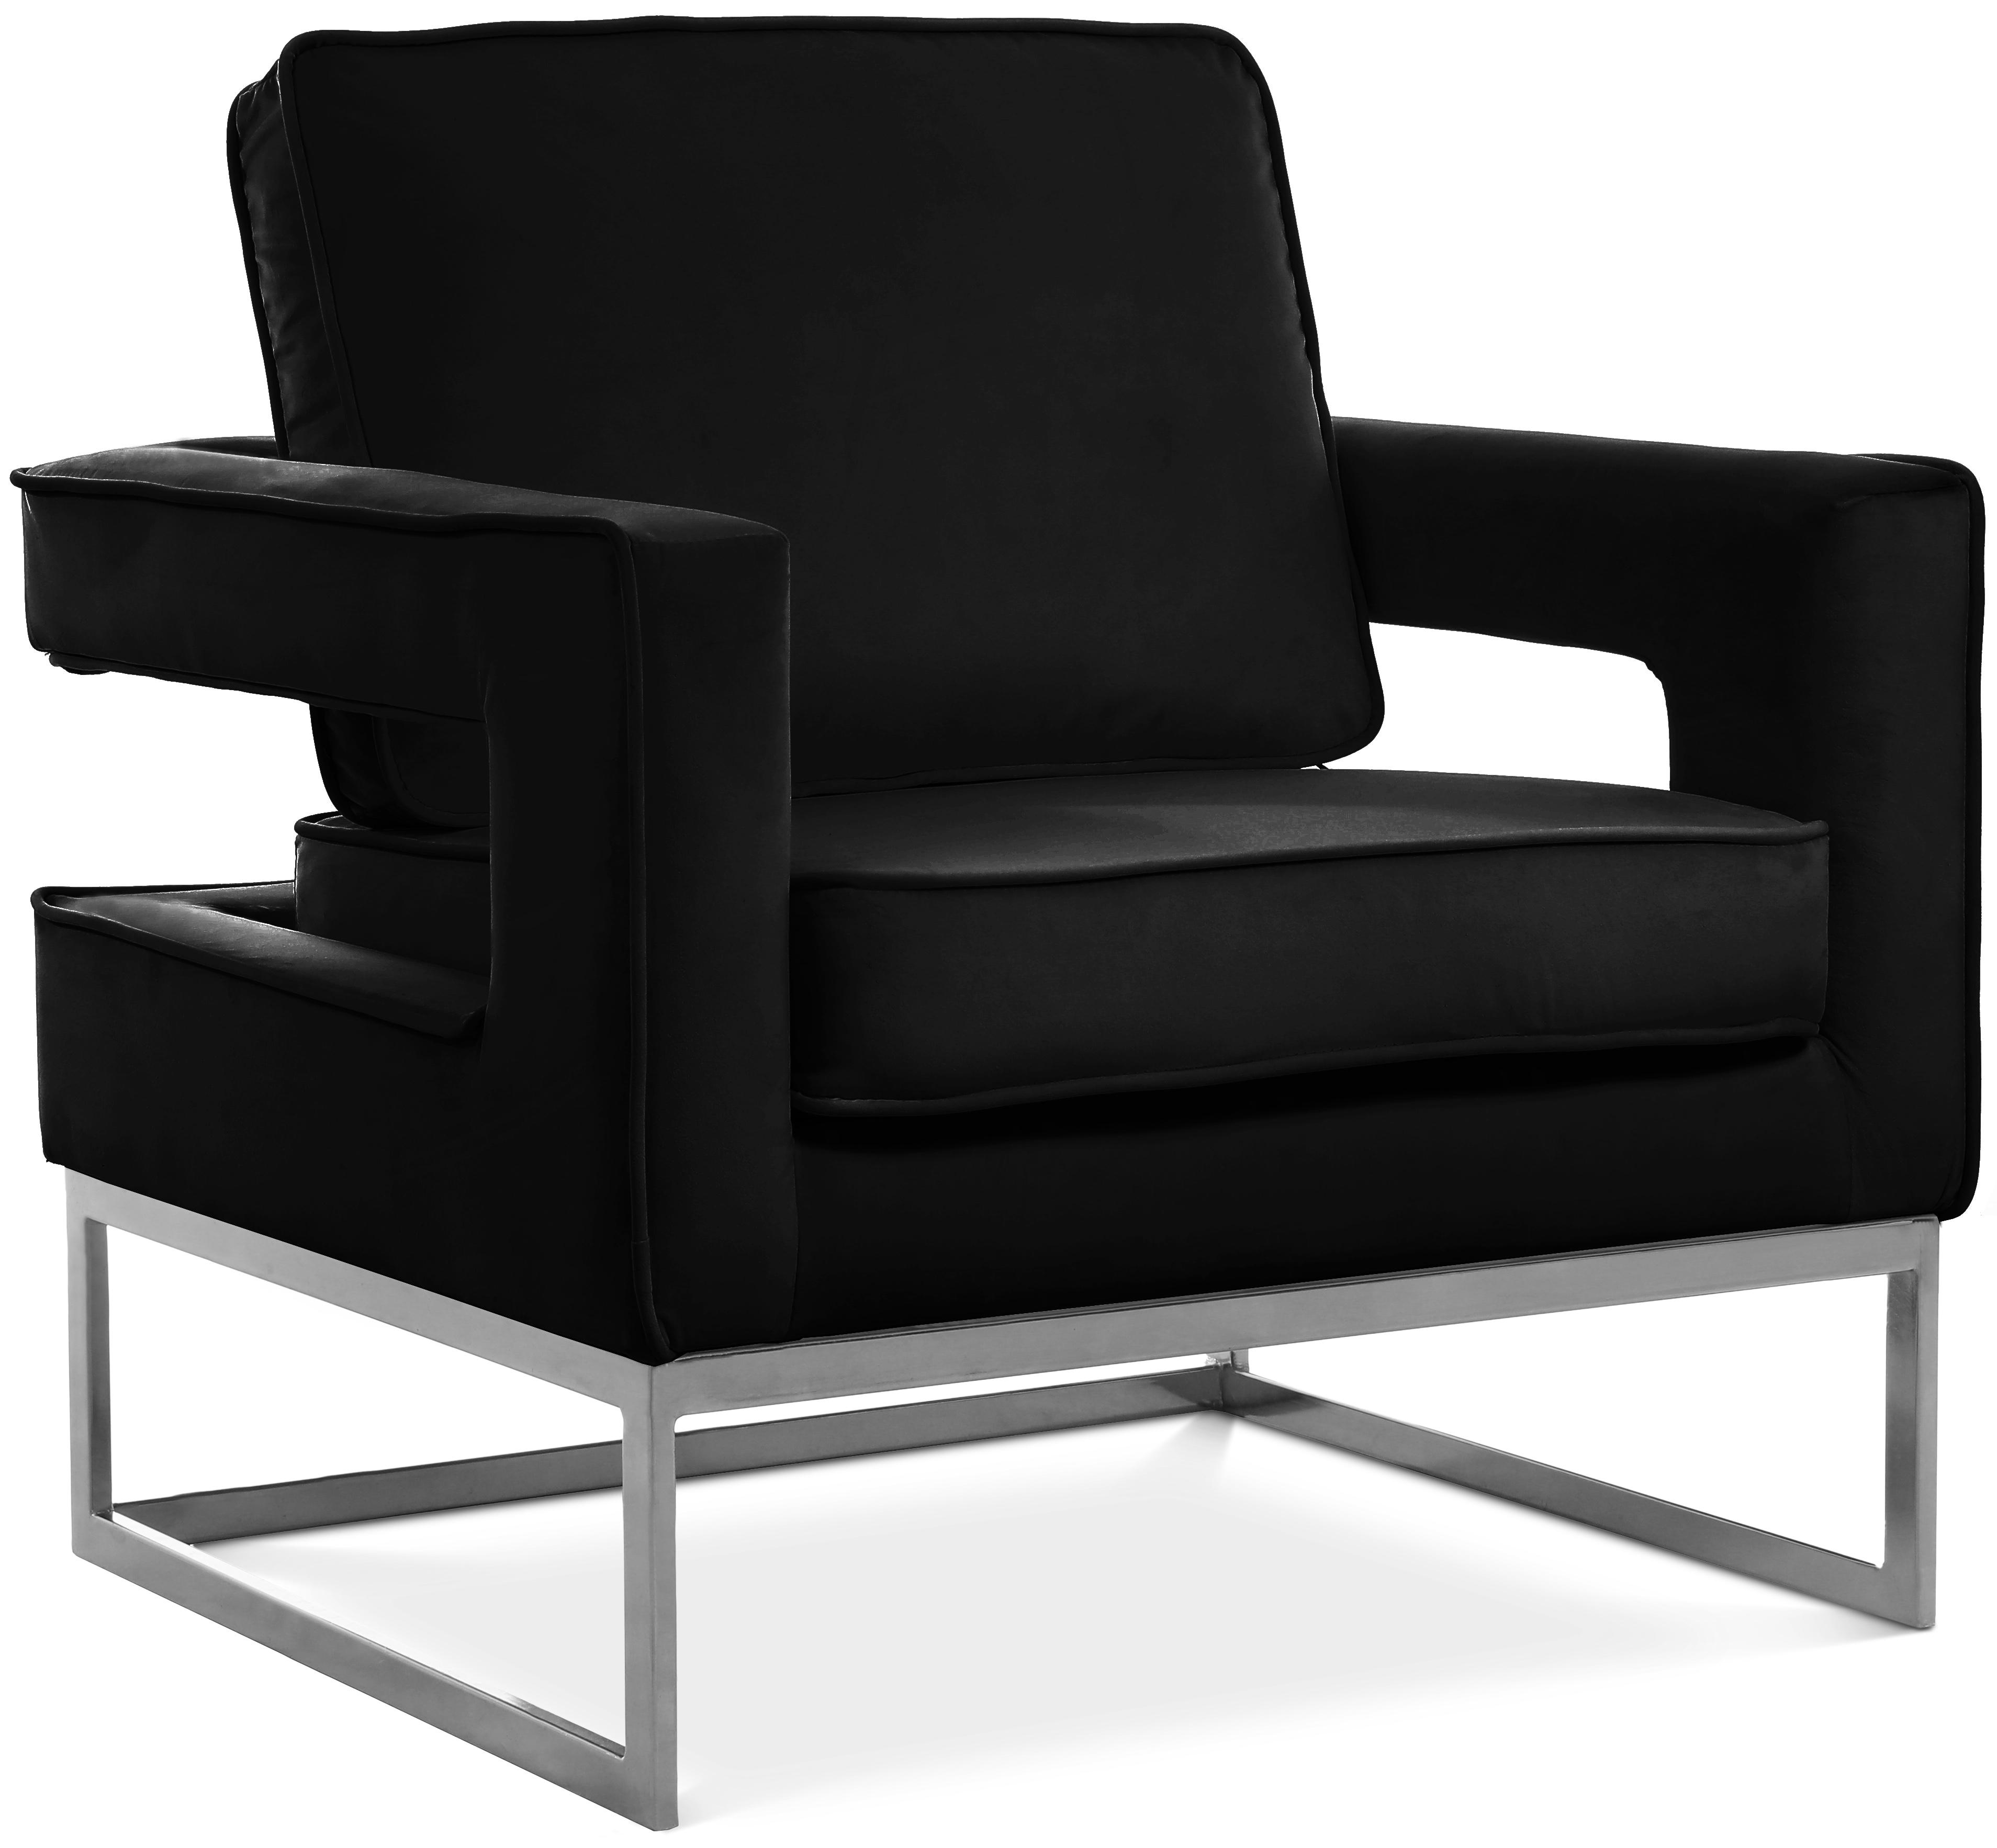 Noah Black Velvet Accent Chair